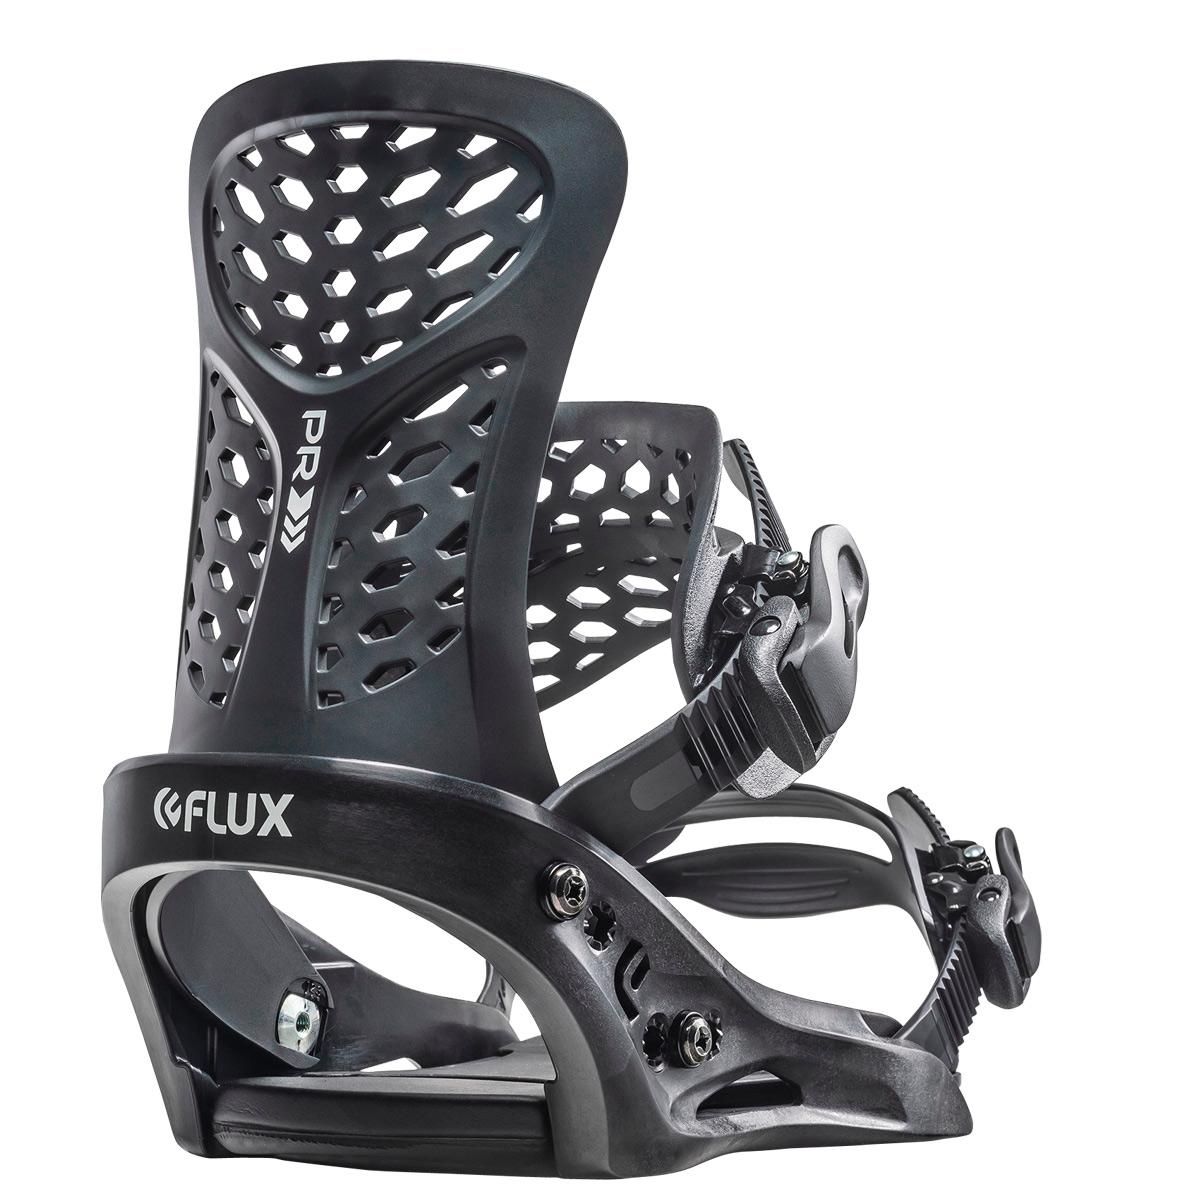 Flux PR Black Snowboard Bindings